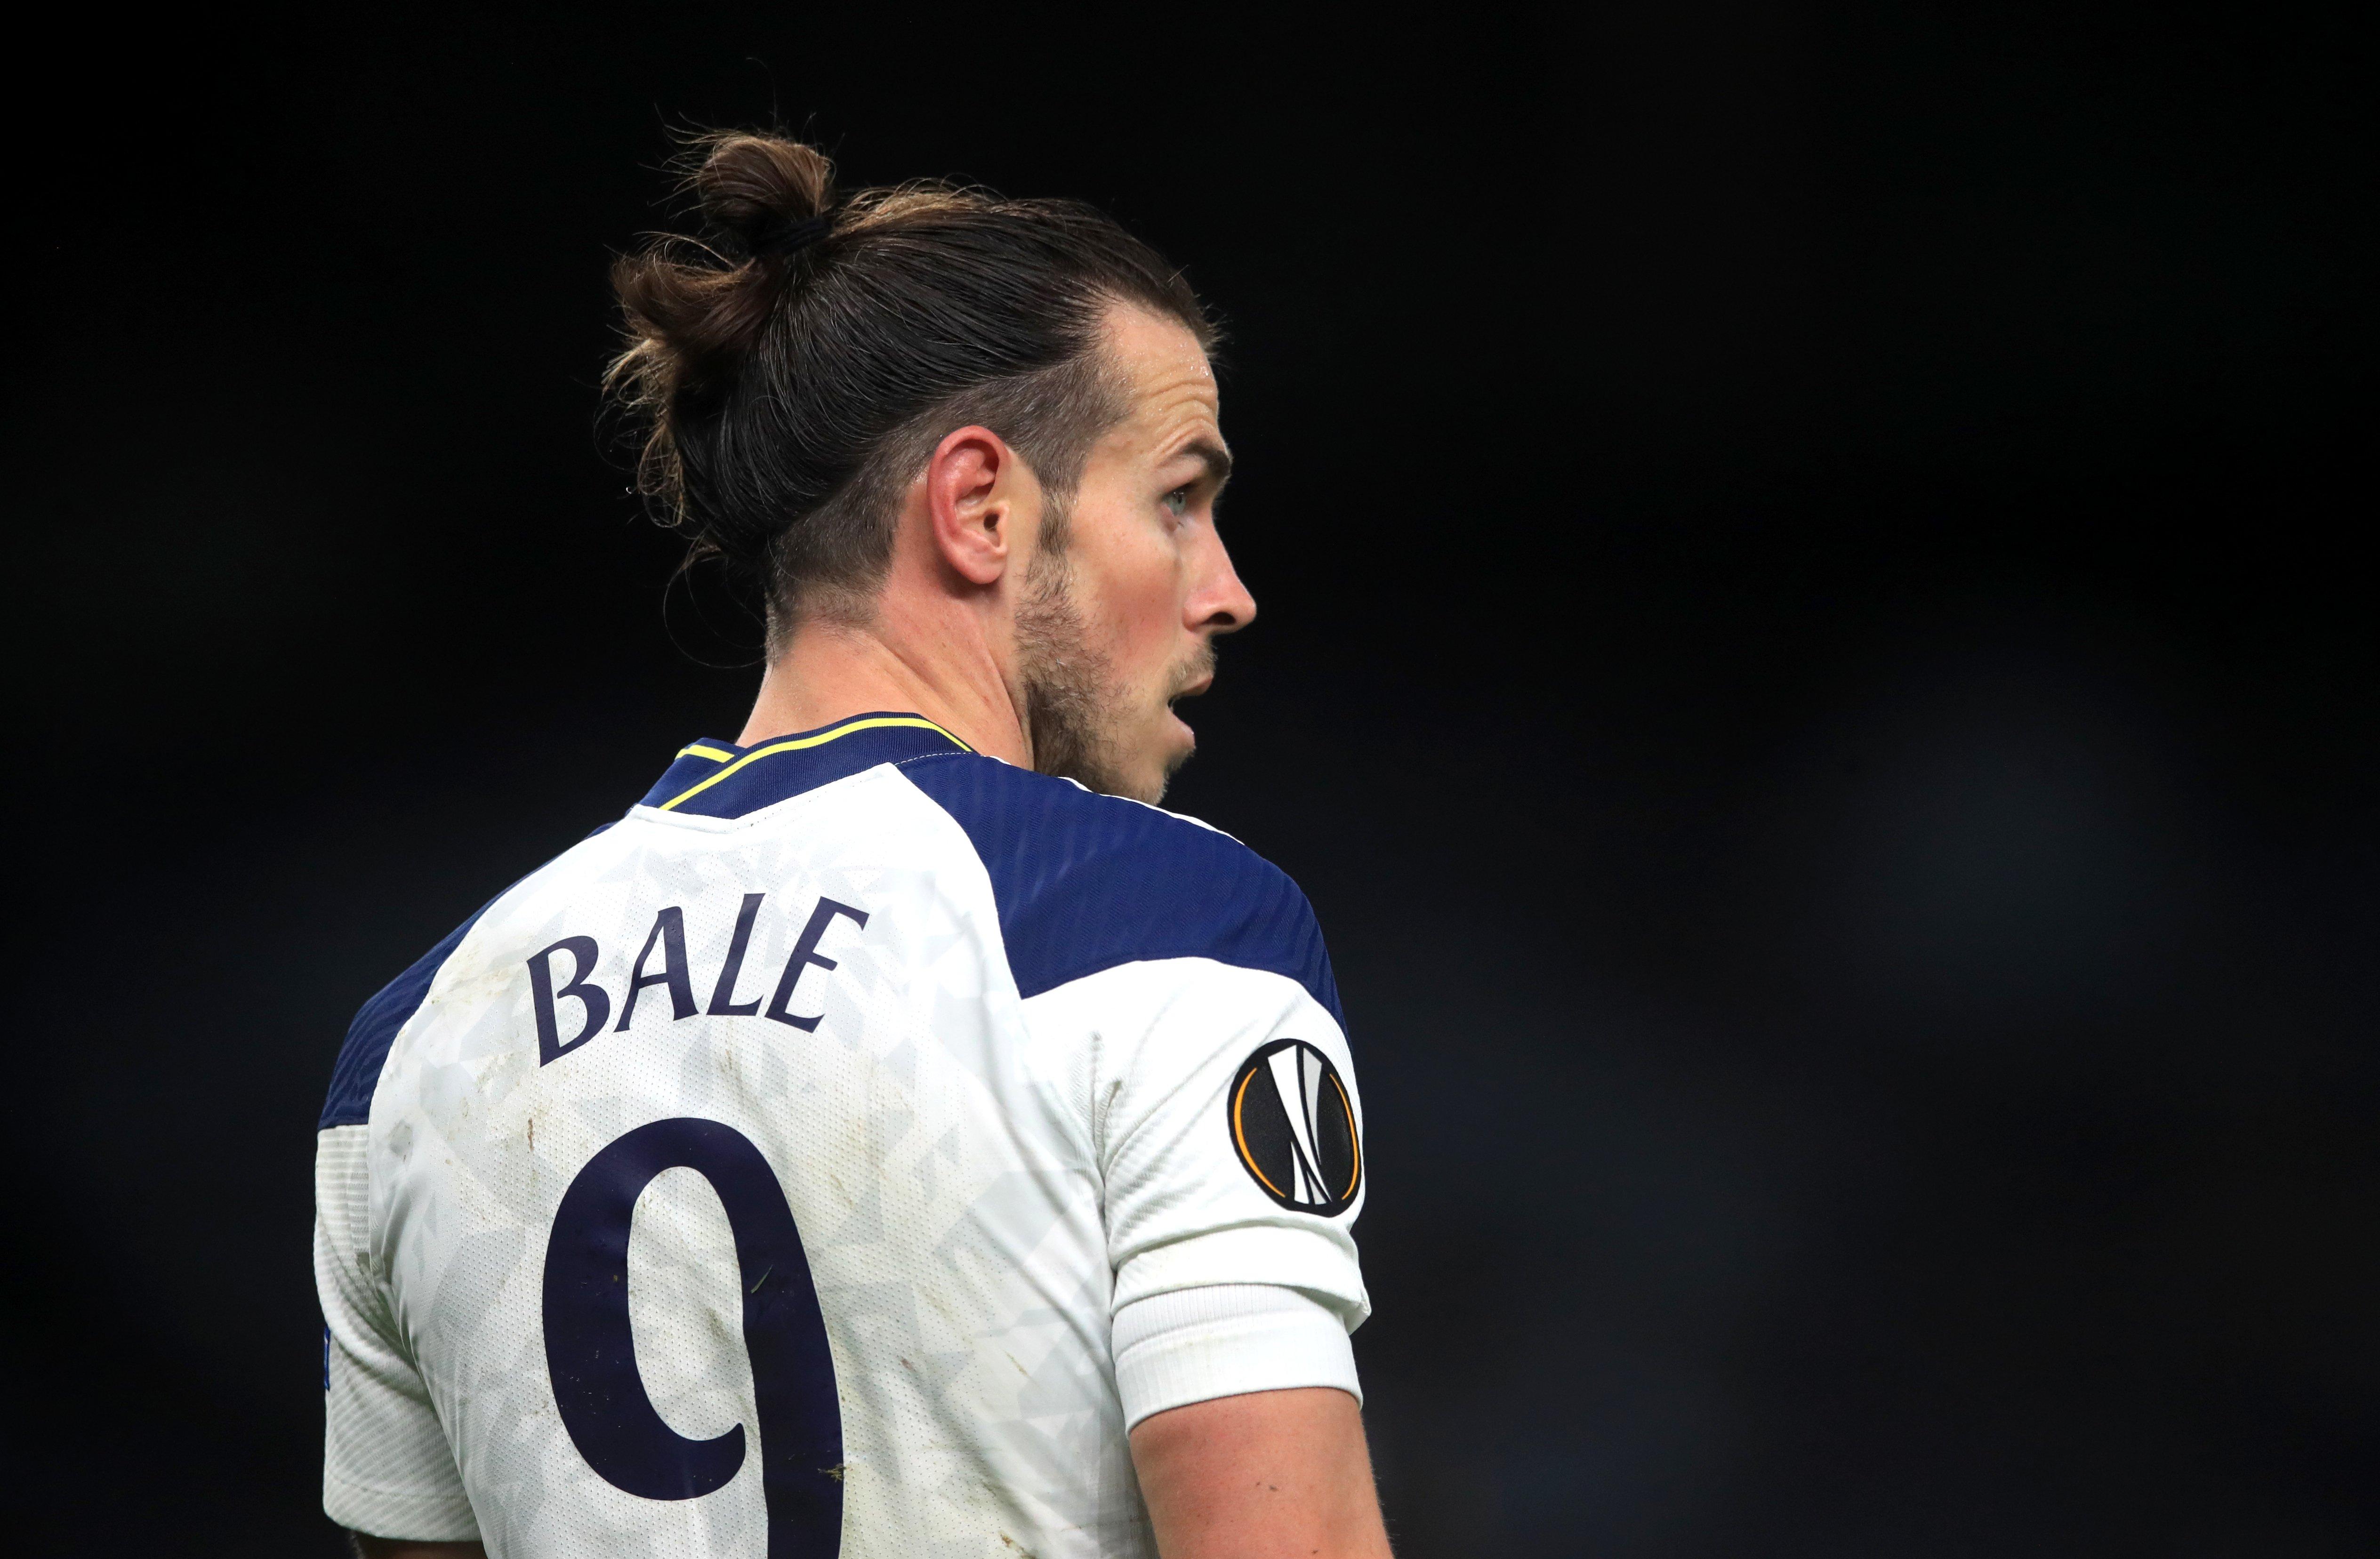 Jose Mourinho says Gareth Bale is ready to make his mark at Tottenham